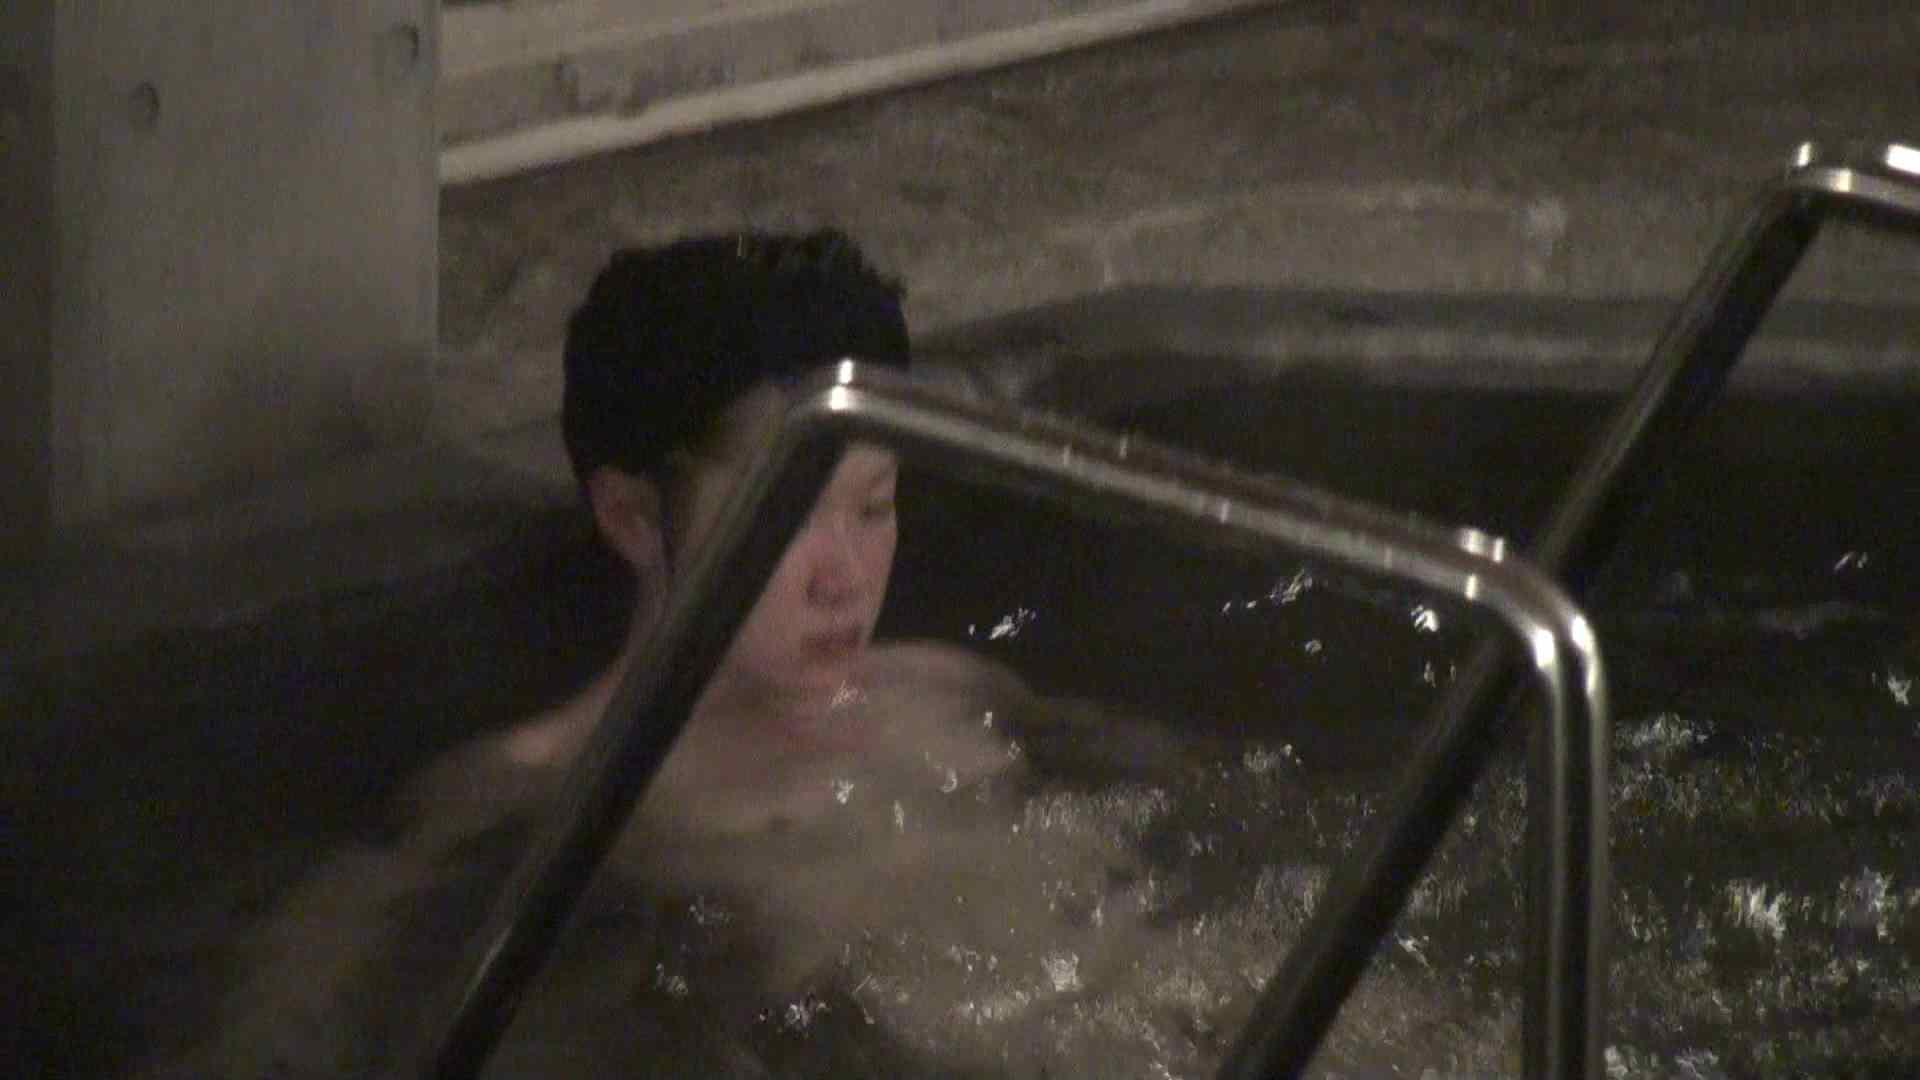 Aquaな露天風呂Vol.425 盗撮   OLセックス  105画像 49